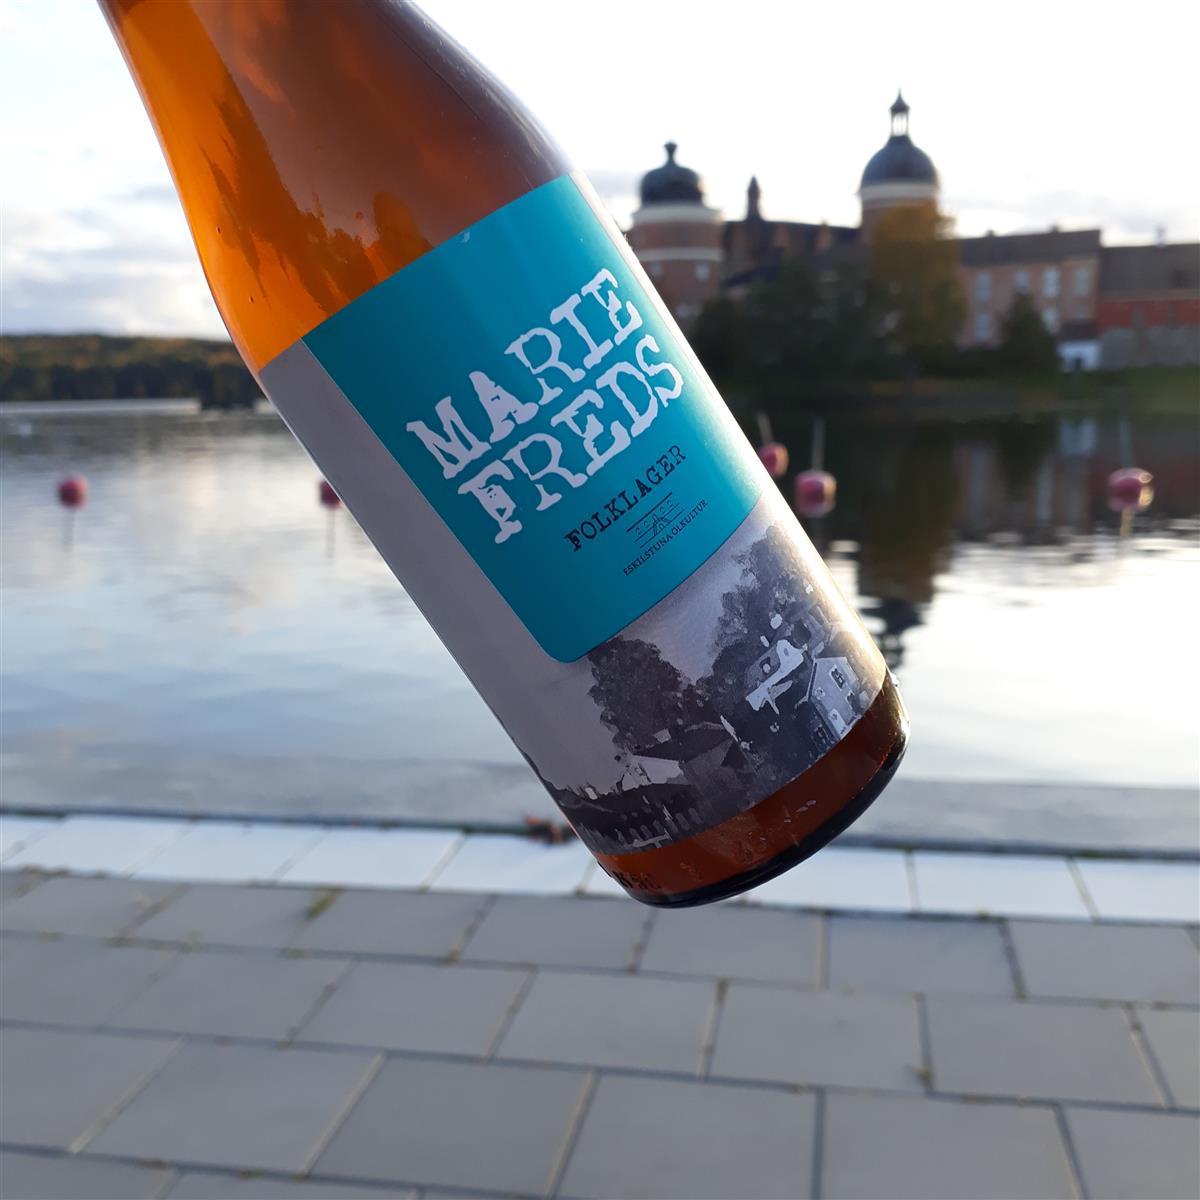 Mariefreds Folklager (Eskilstuna Ölkultur) 3,5%